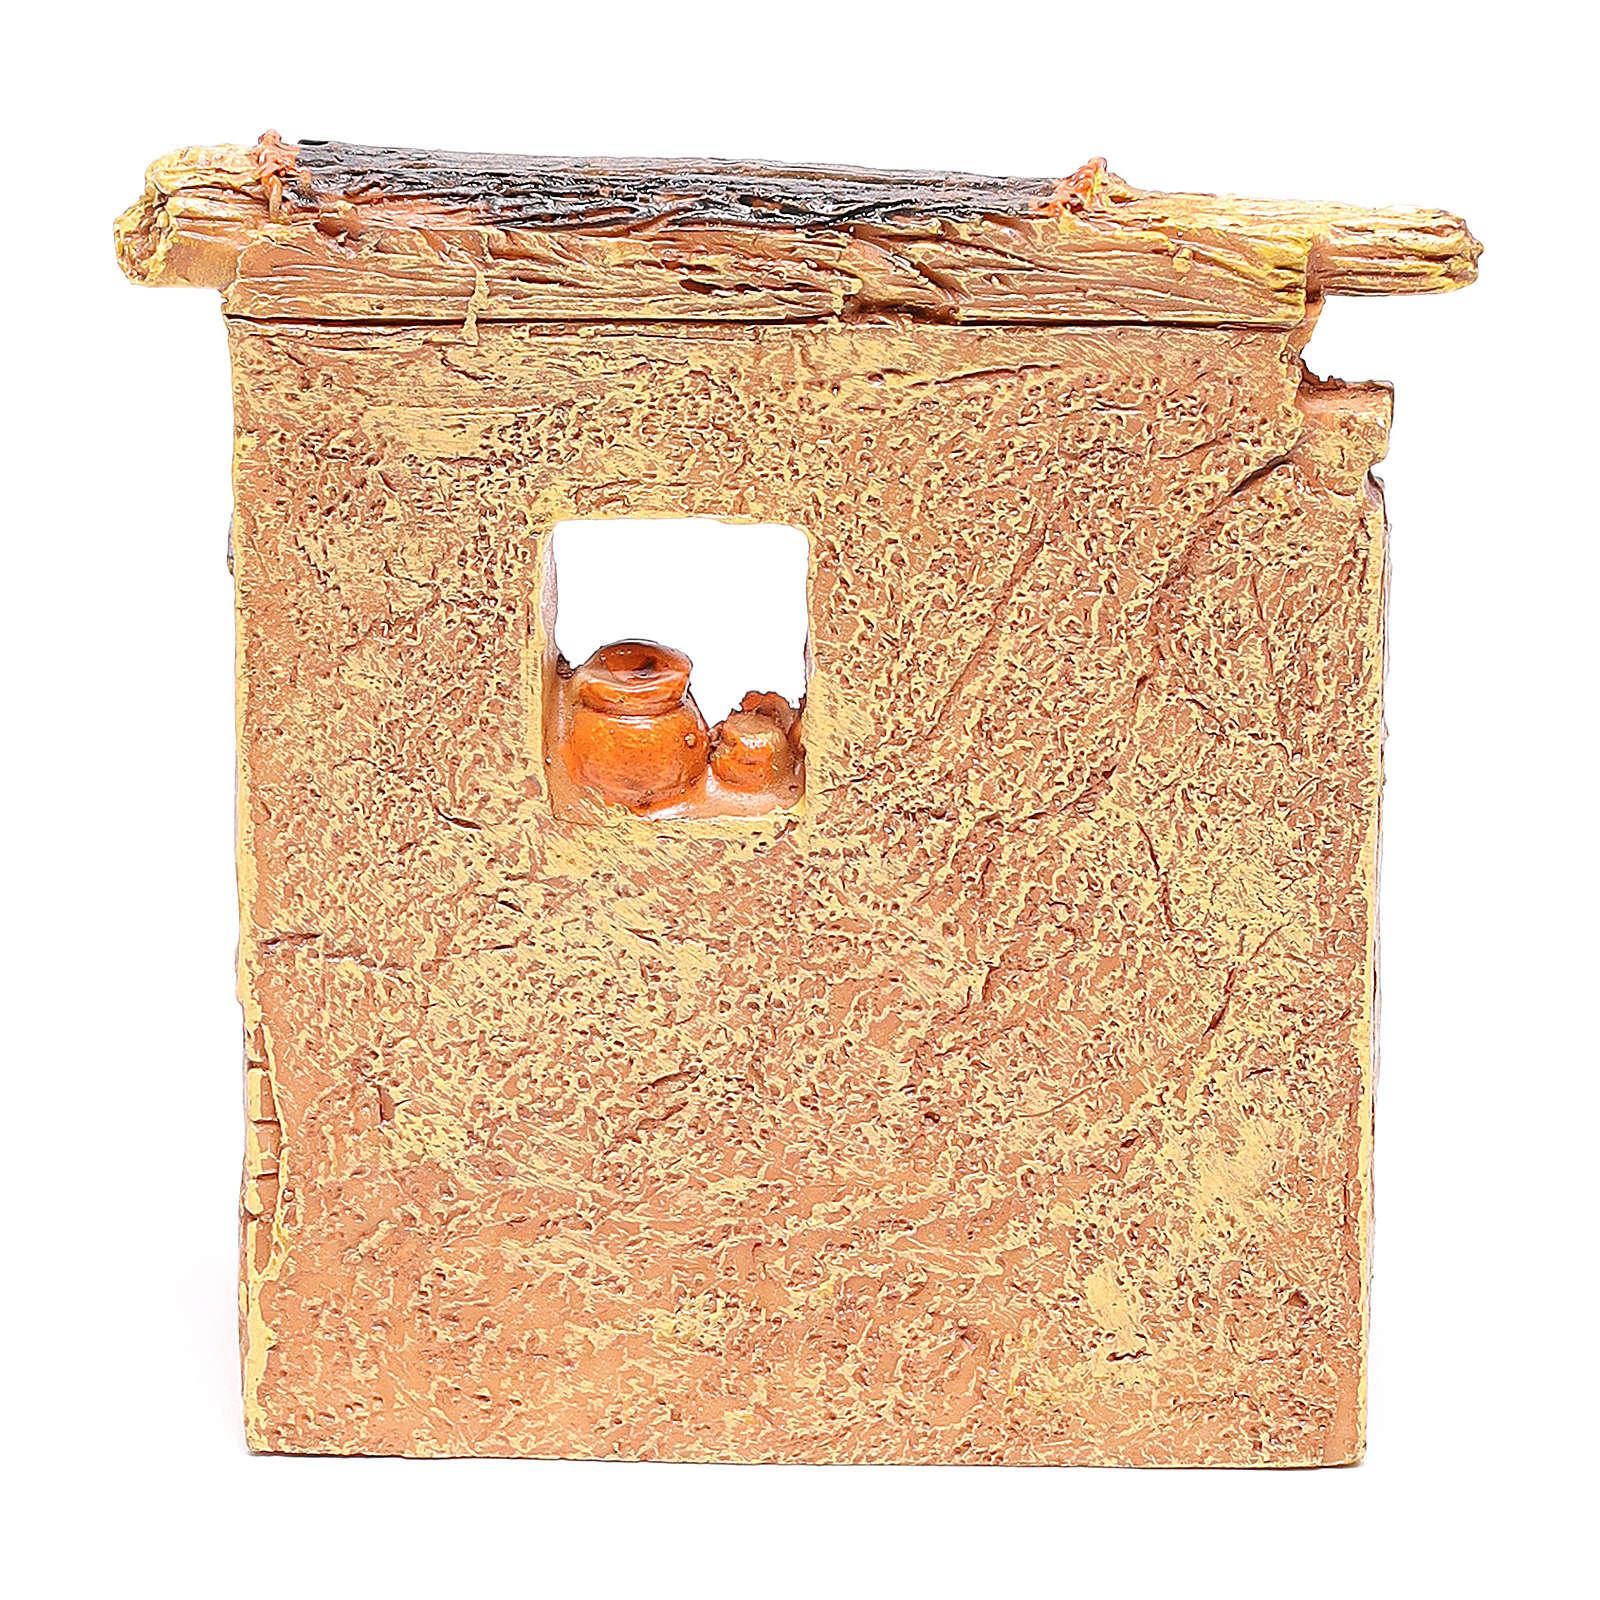 Taller carpintero 10x8x5 cm para belén 6-8 cm 4